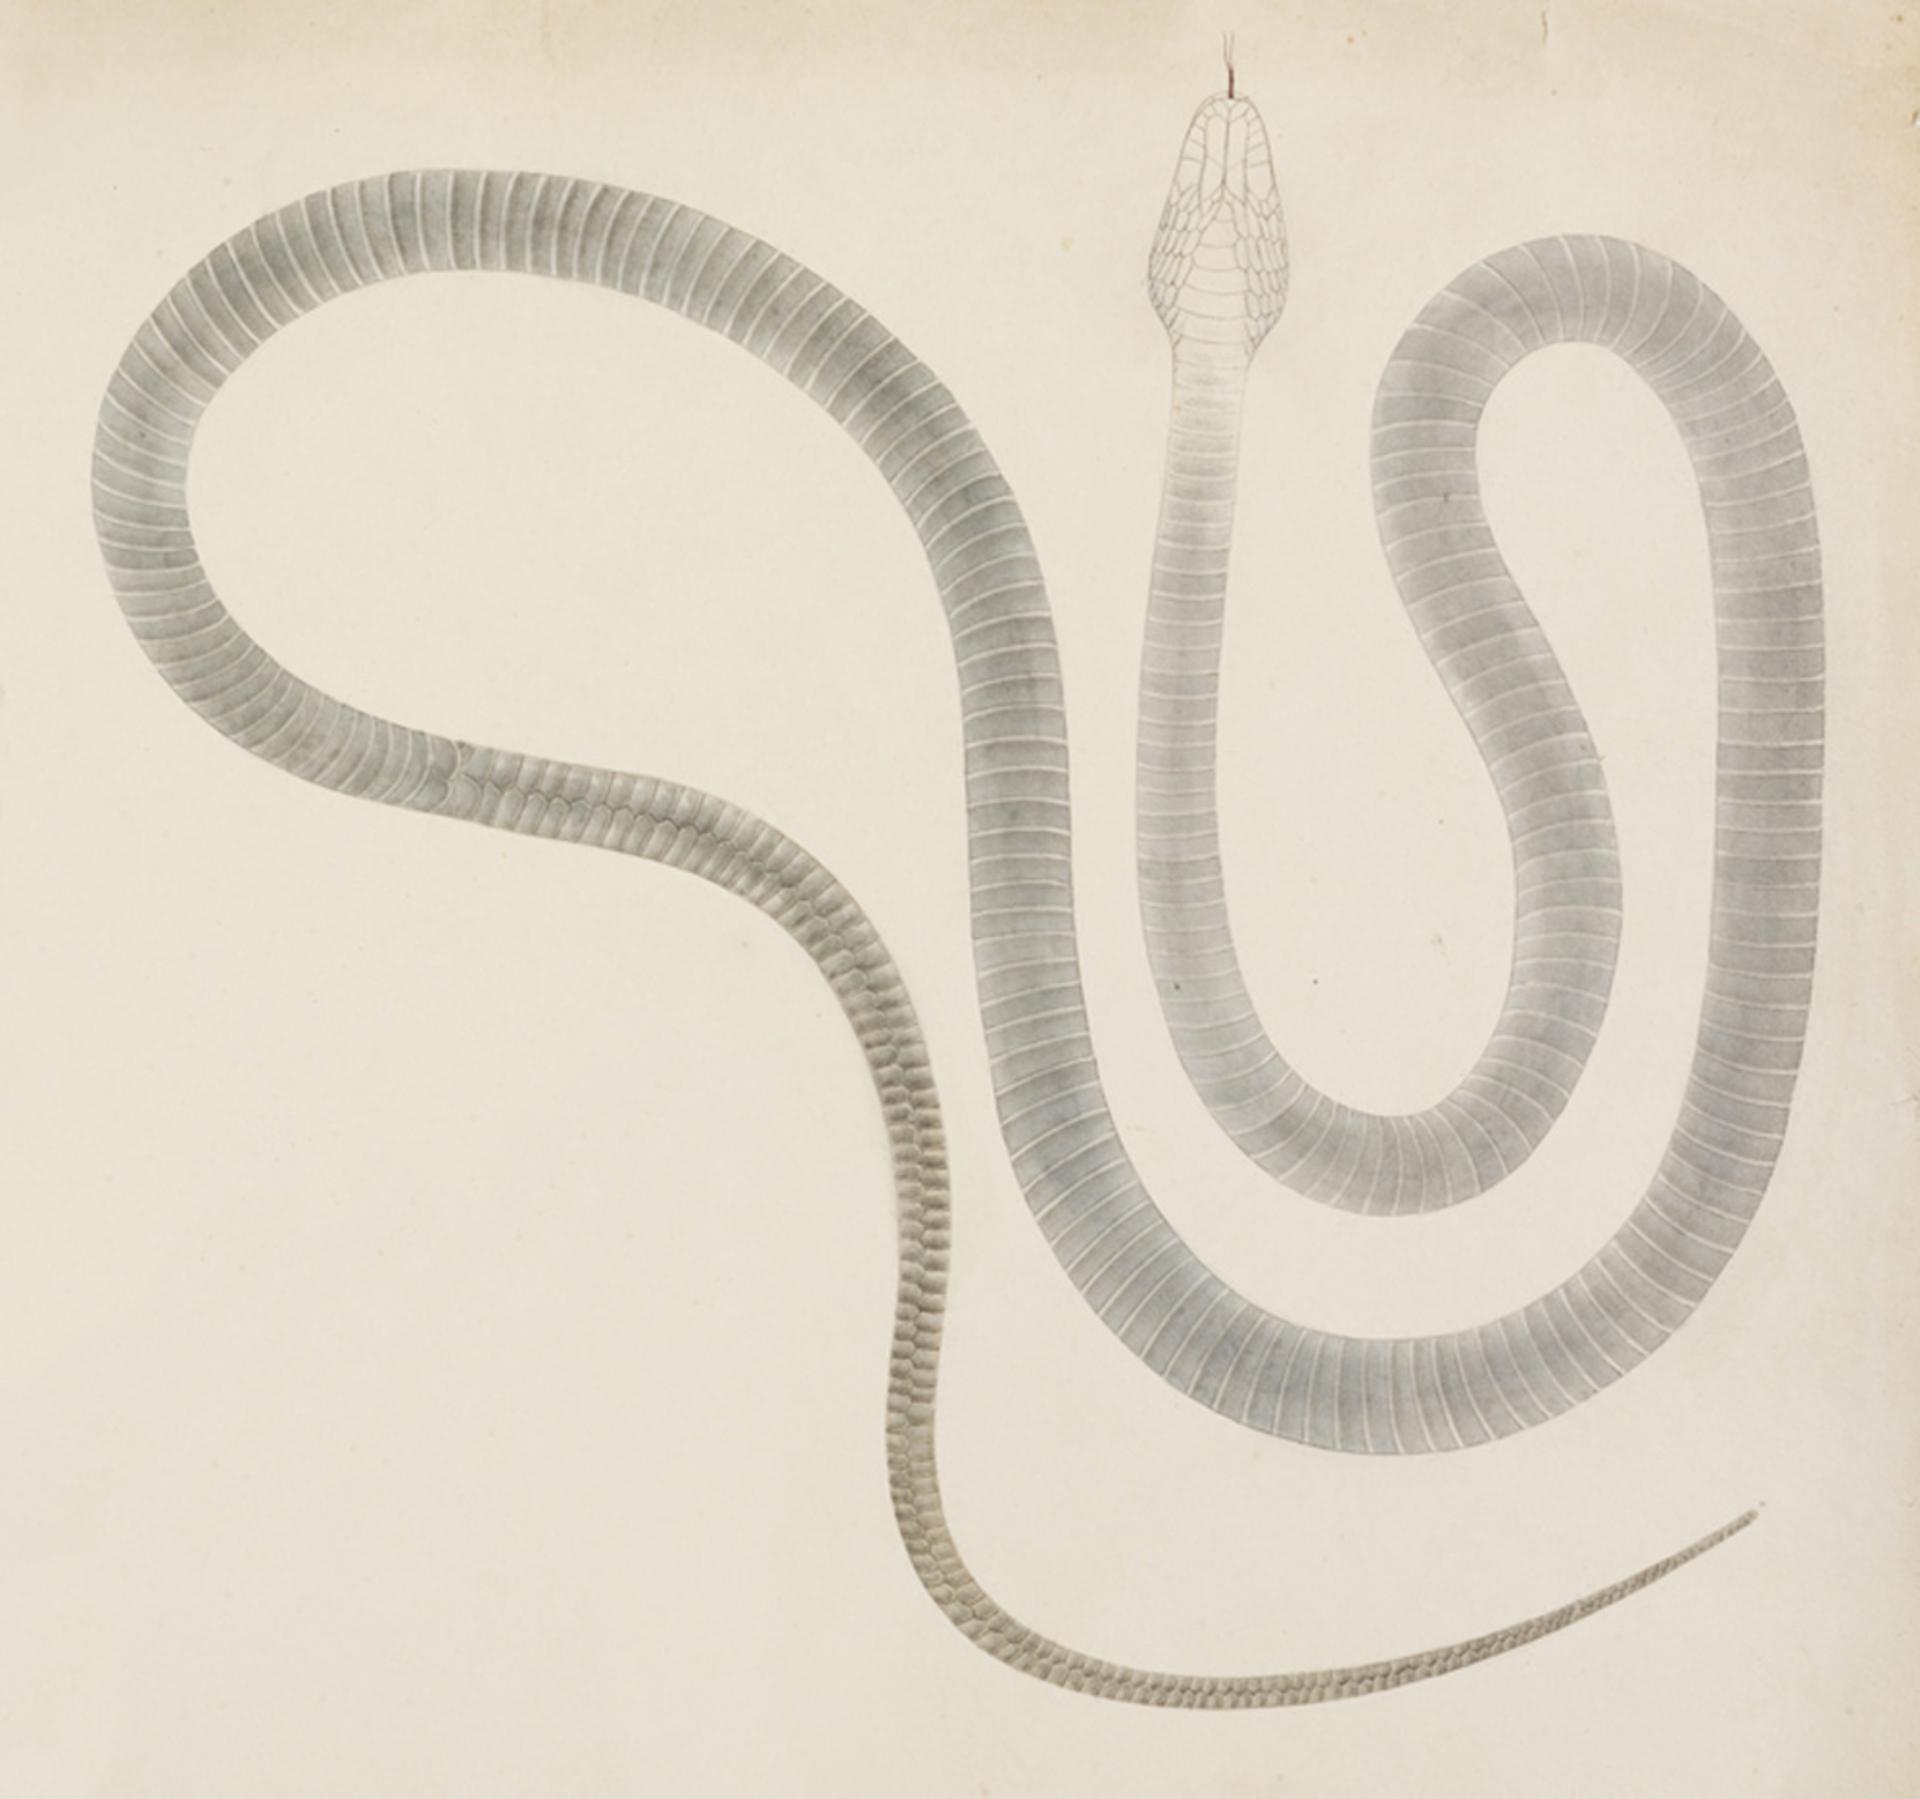 RMNH.ART.109 | Elaphe climacophora